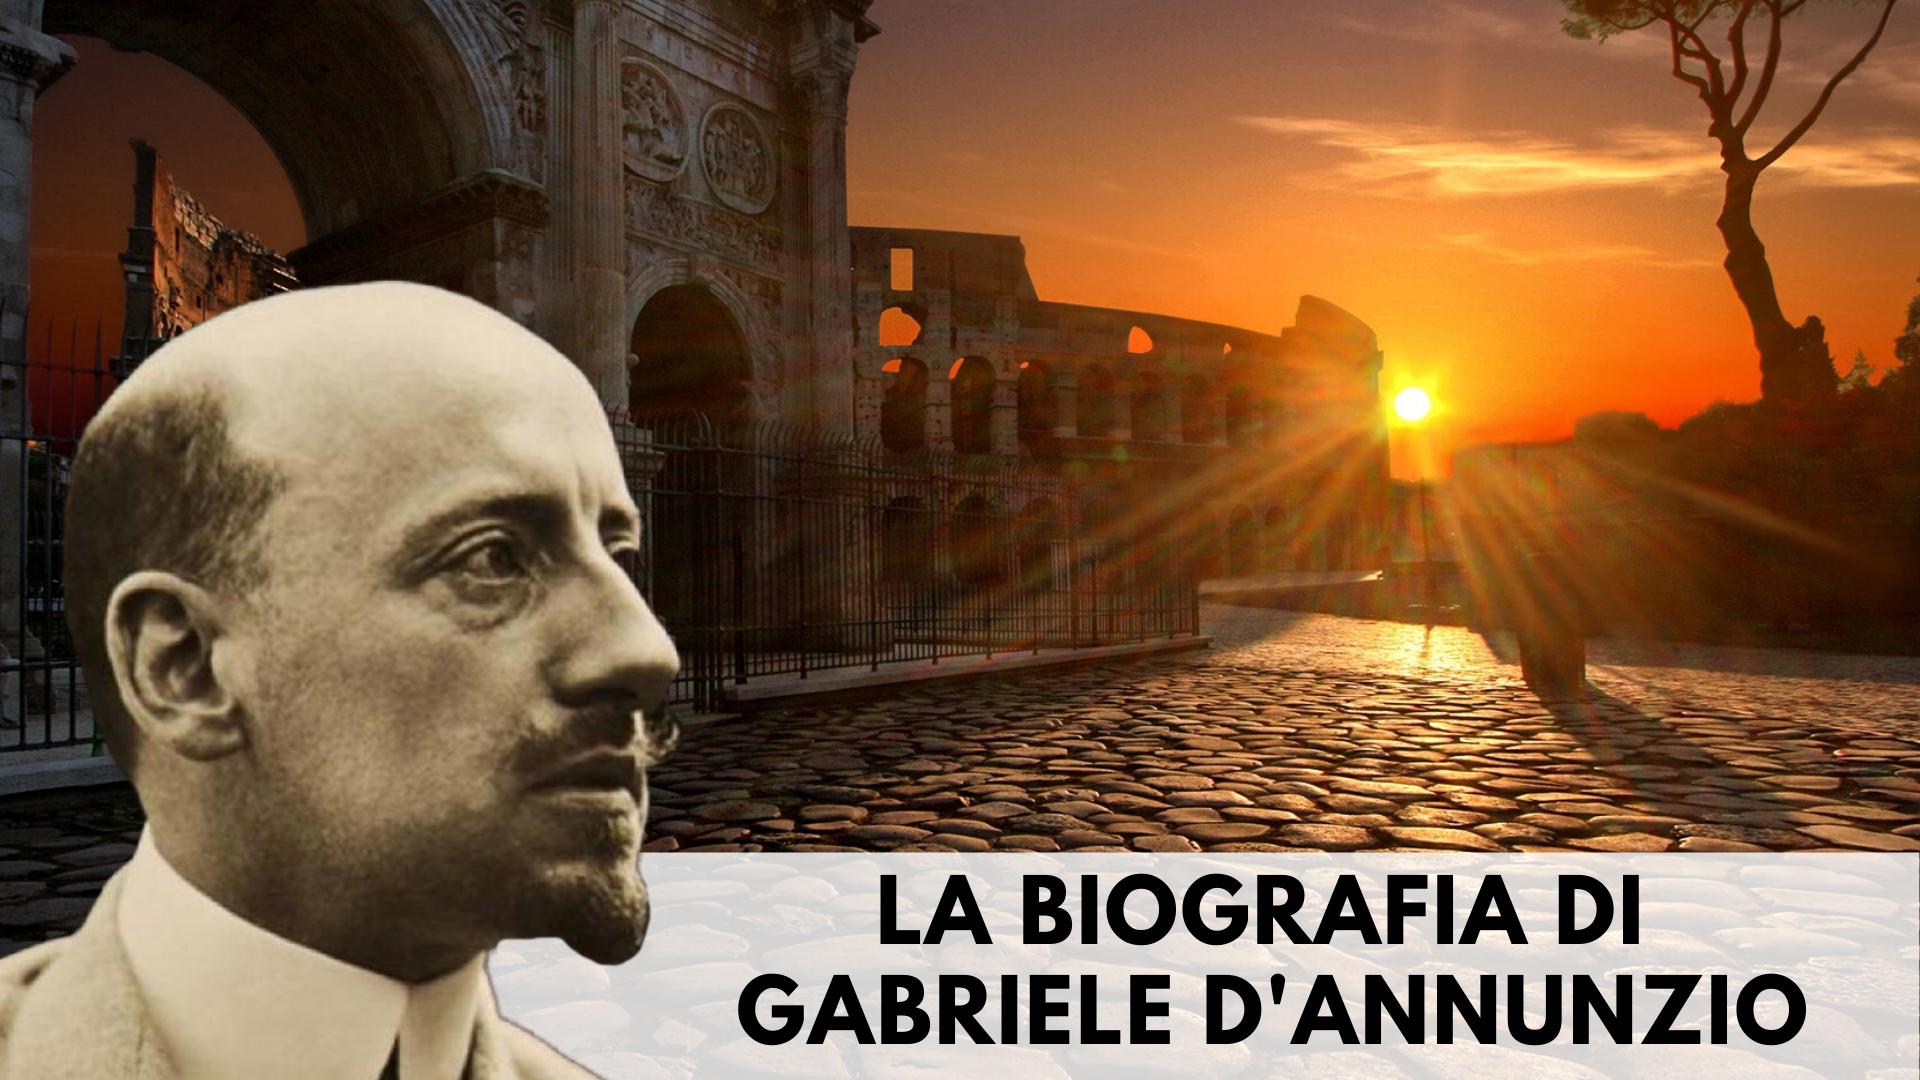 La biografia di Gabriele D'Annunzio